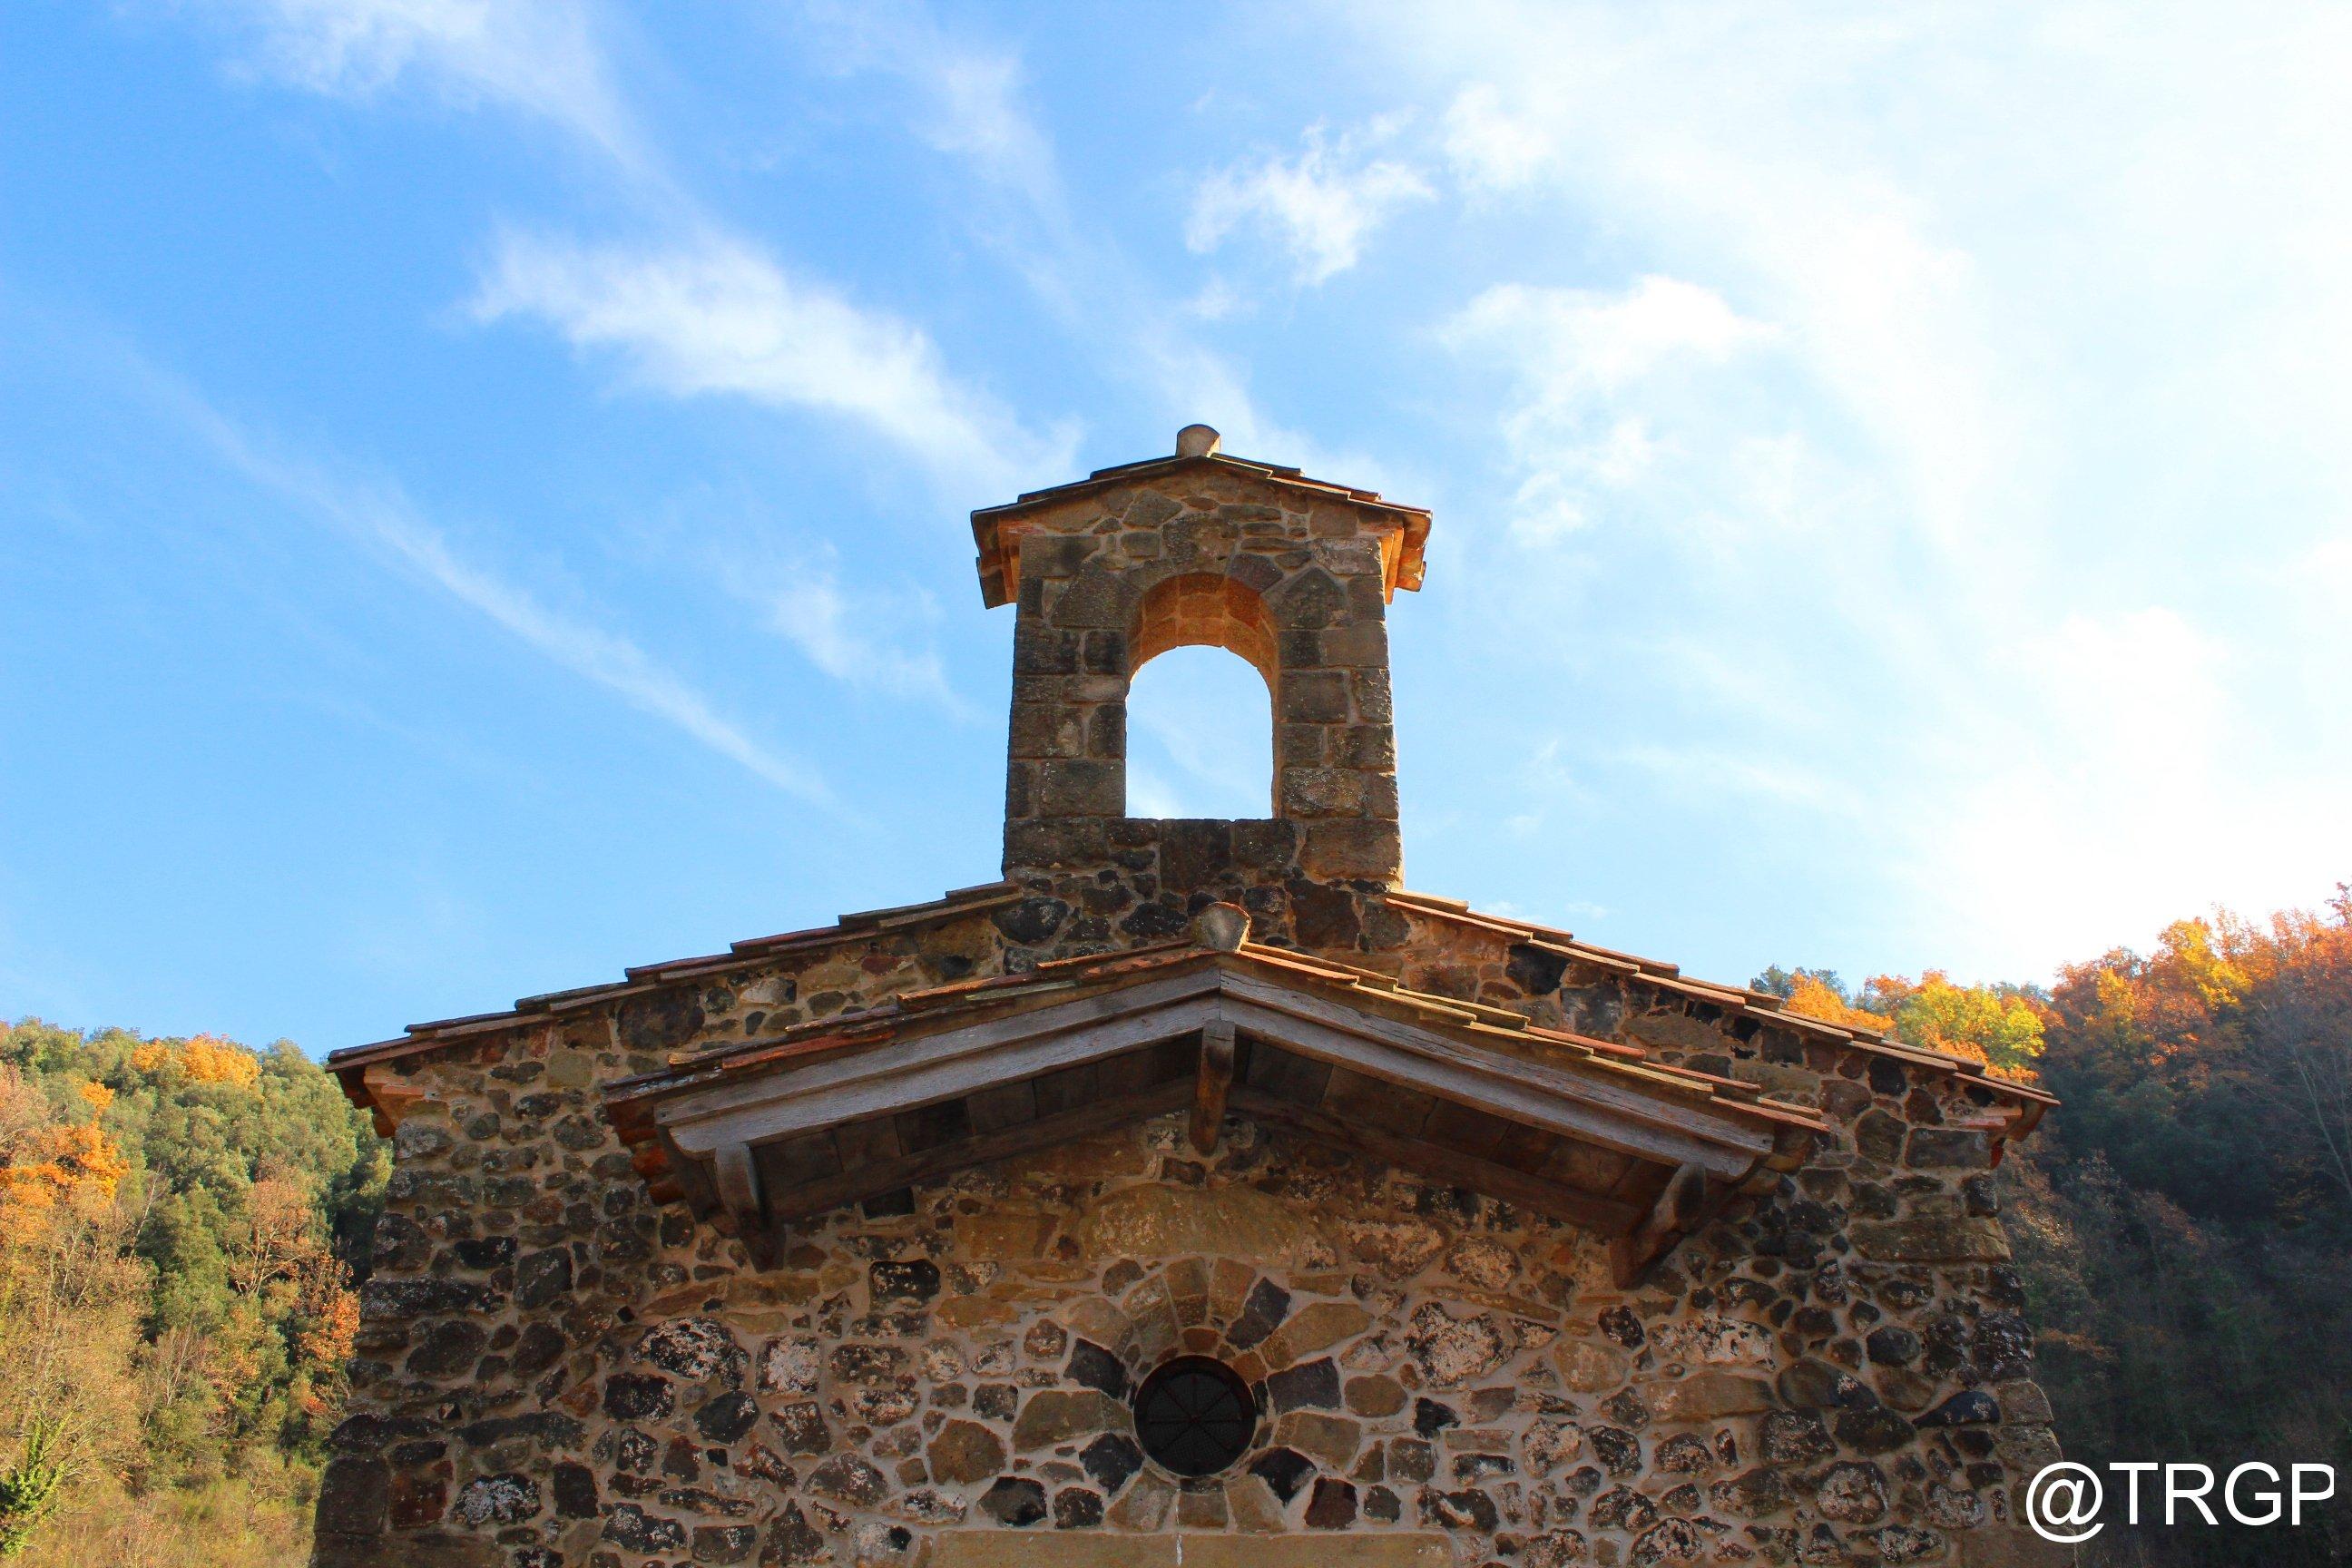 Volca Santa Margarida